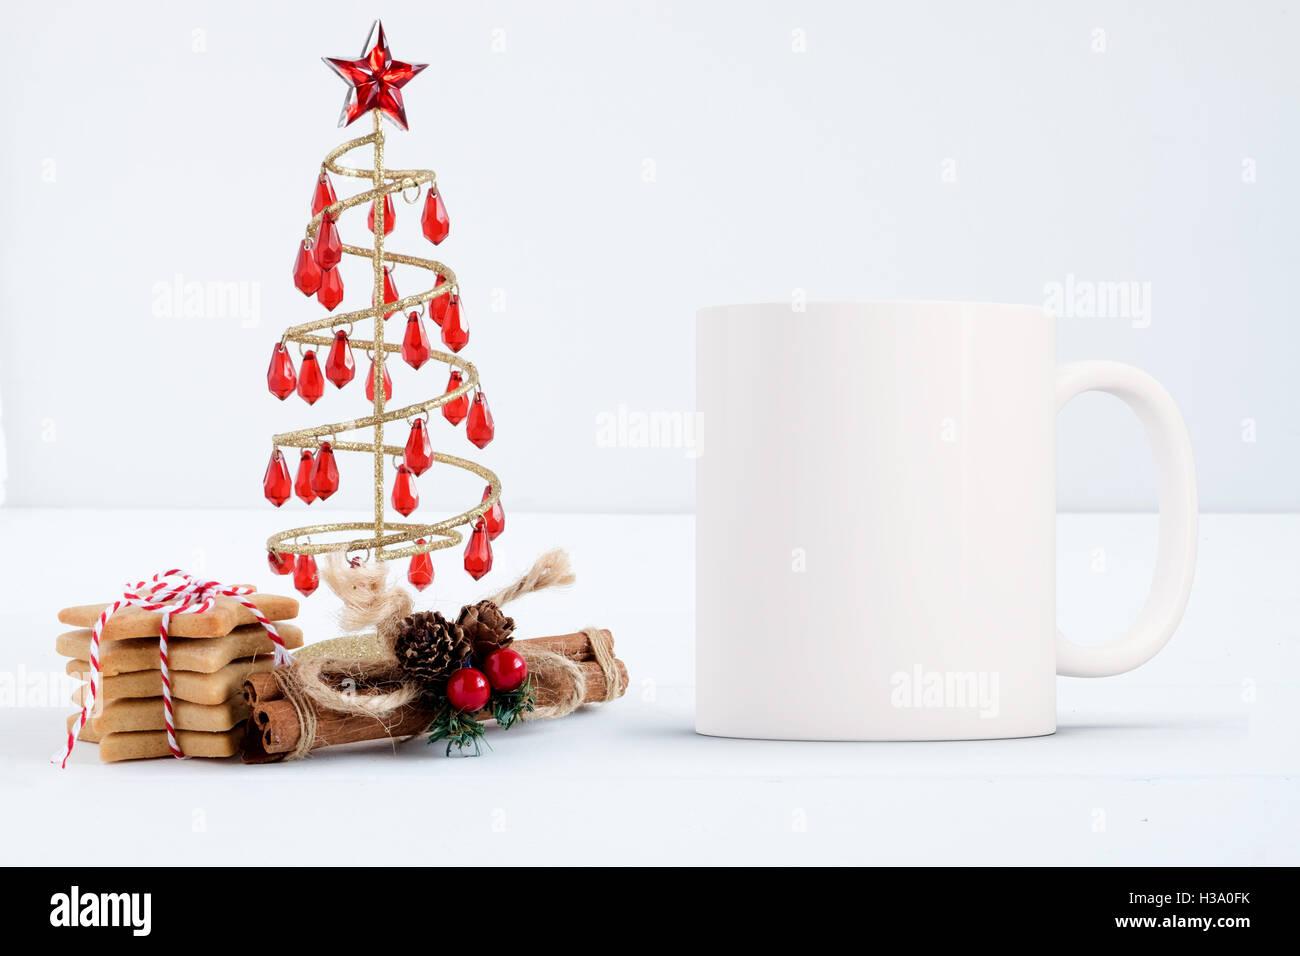 Where Can I Buy A Live Christmas Tree